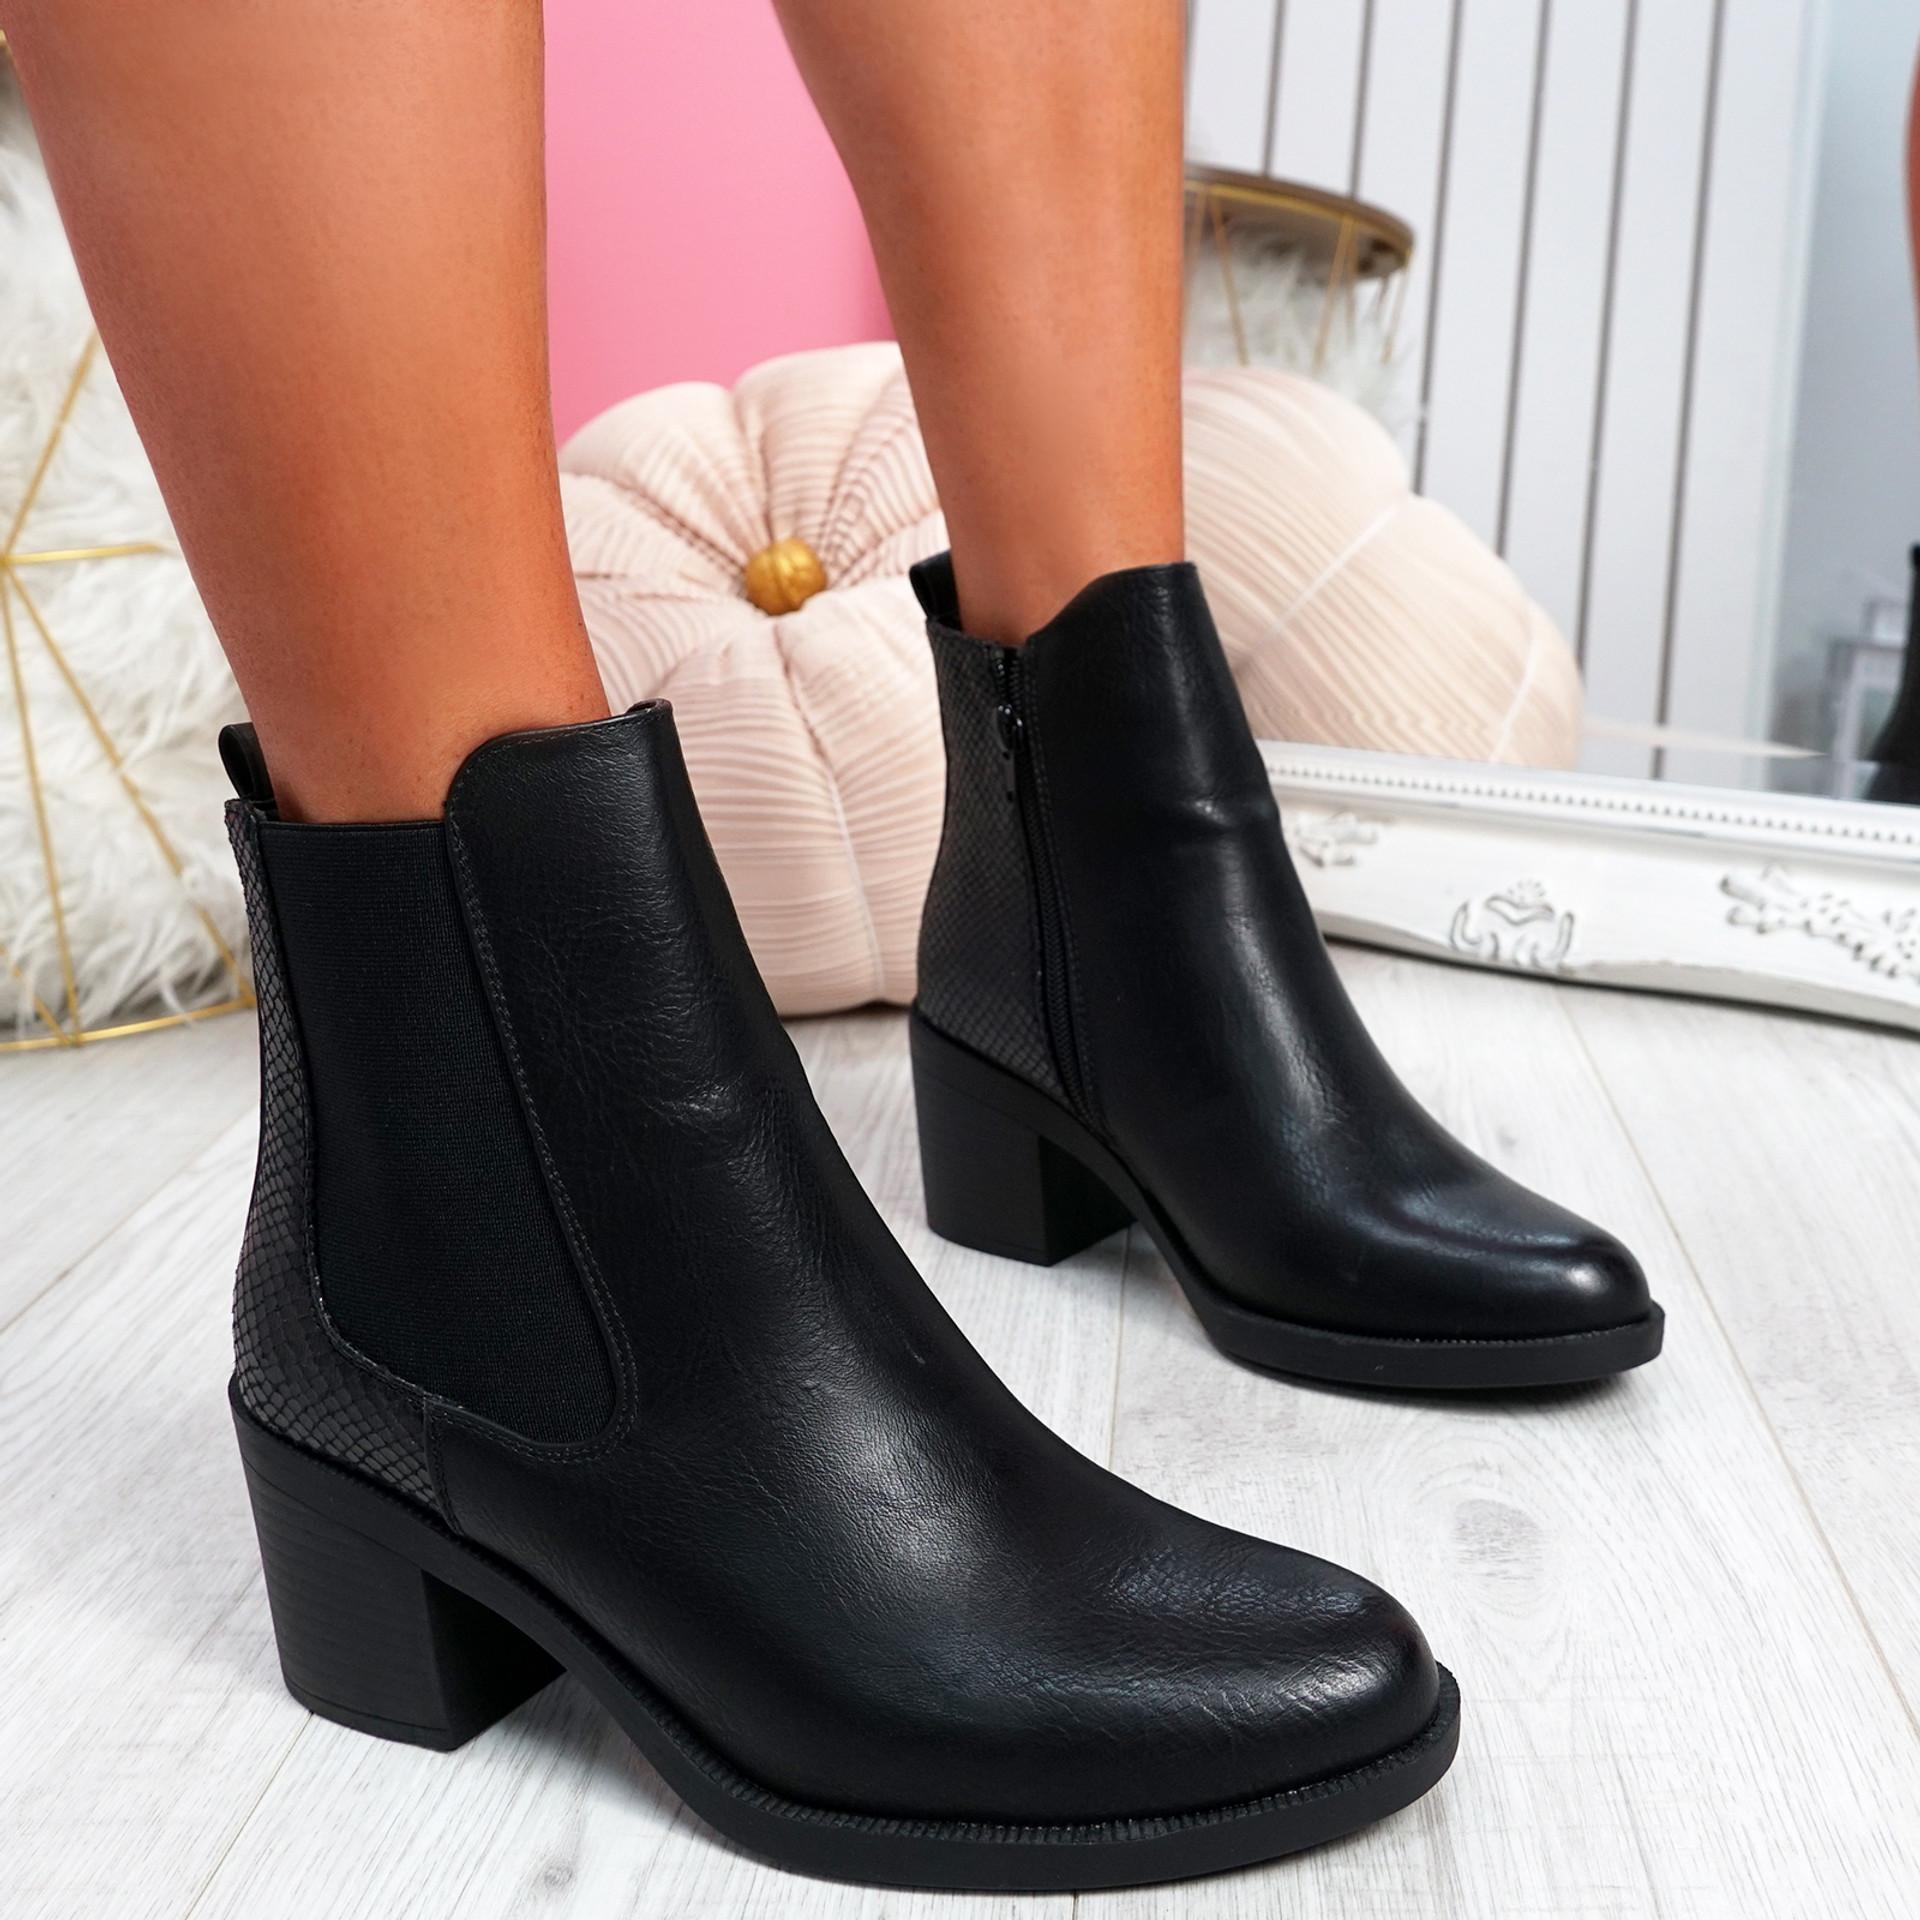 Nuwa Black Snake Block Heel Ankle Boots